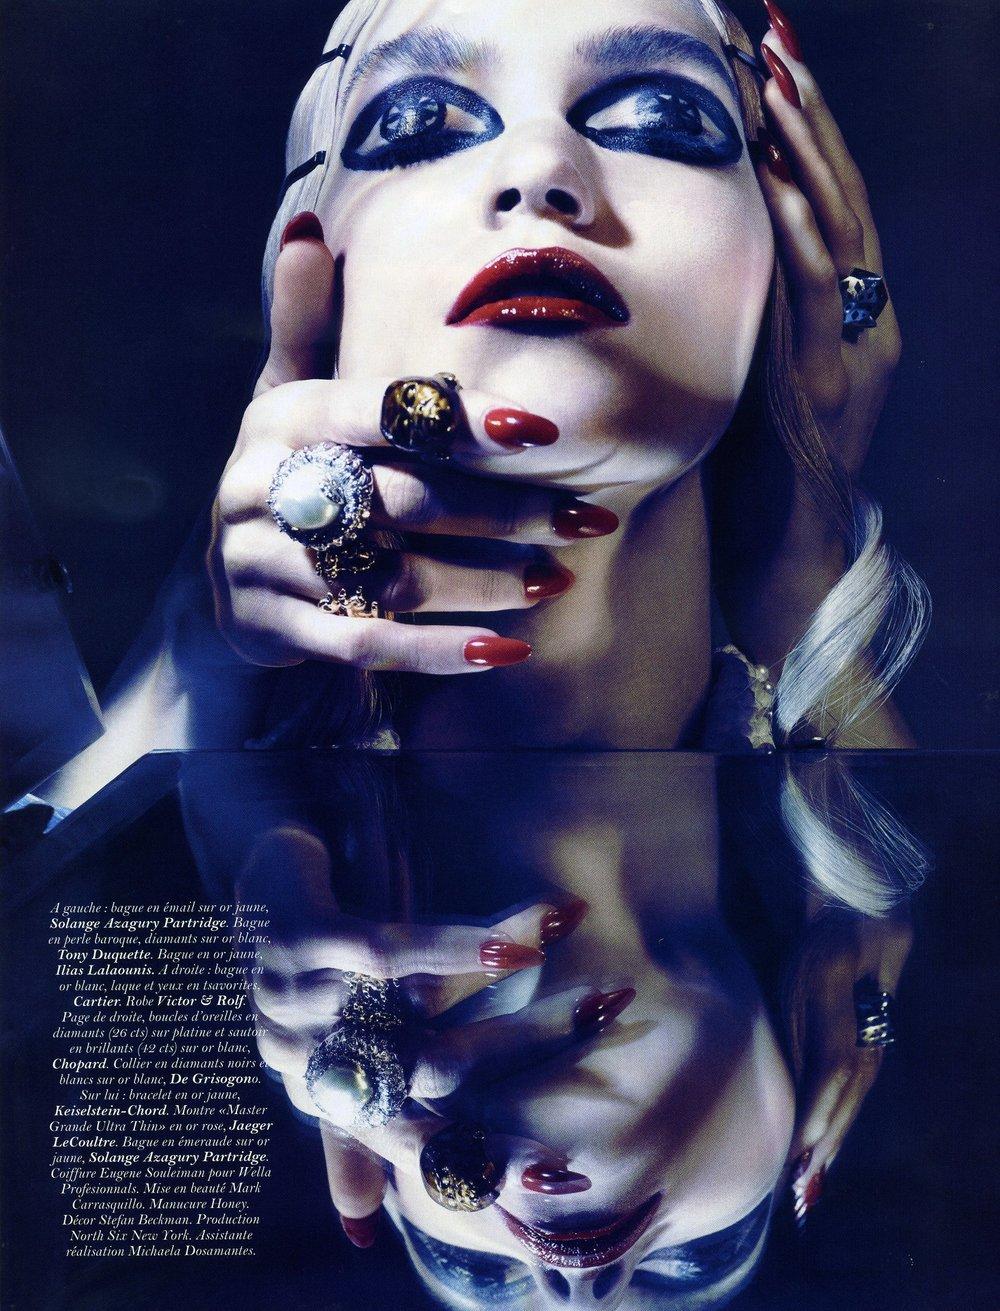 Giovanna-Battaglia-6-Audace-Manifeste-Vogue-France-Mikael-Jansson.jpg